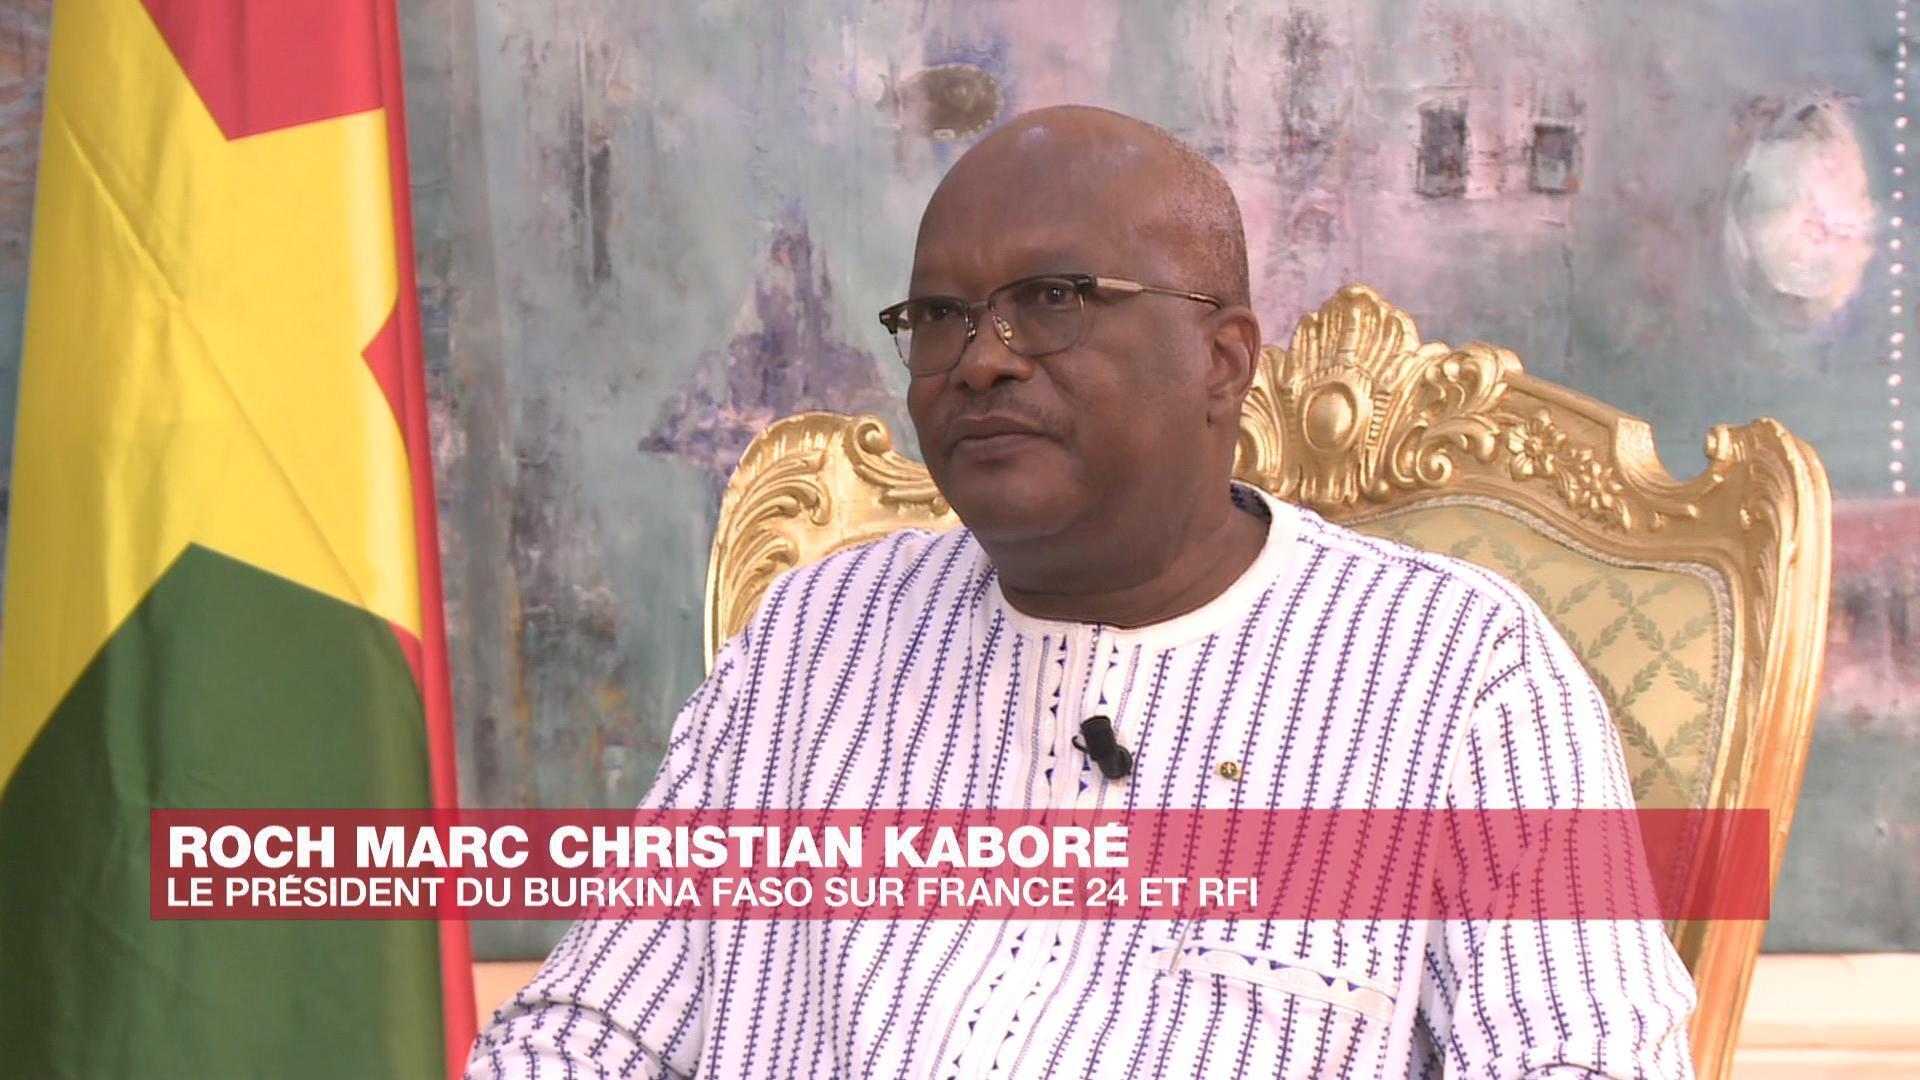 MARC CHRISTIAN KABORE